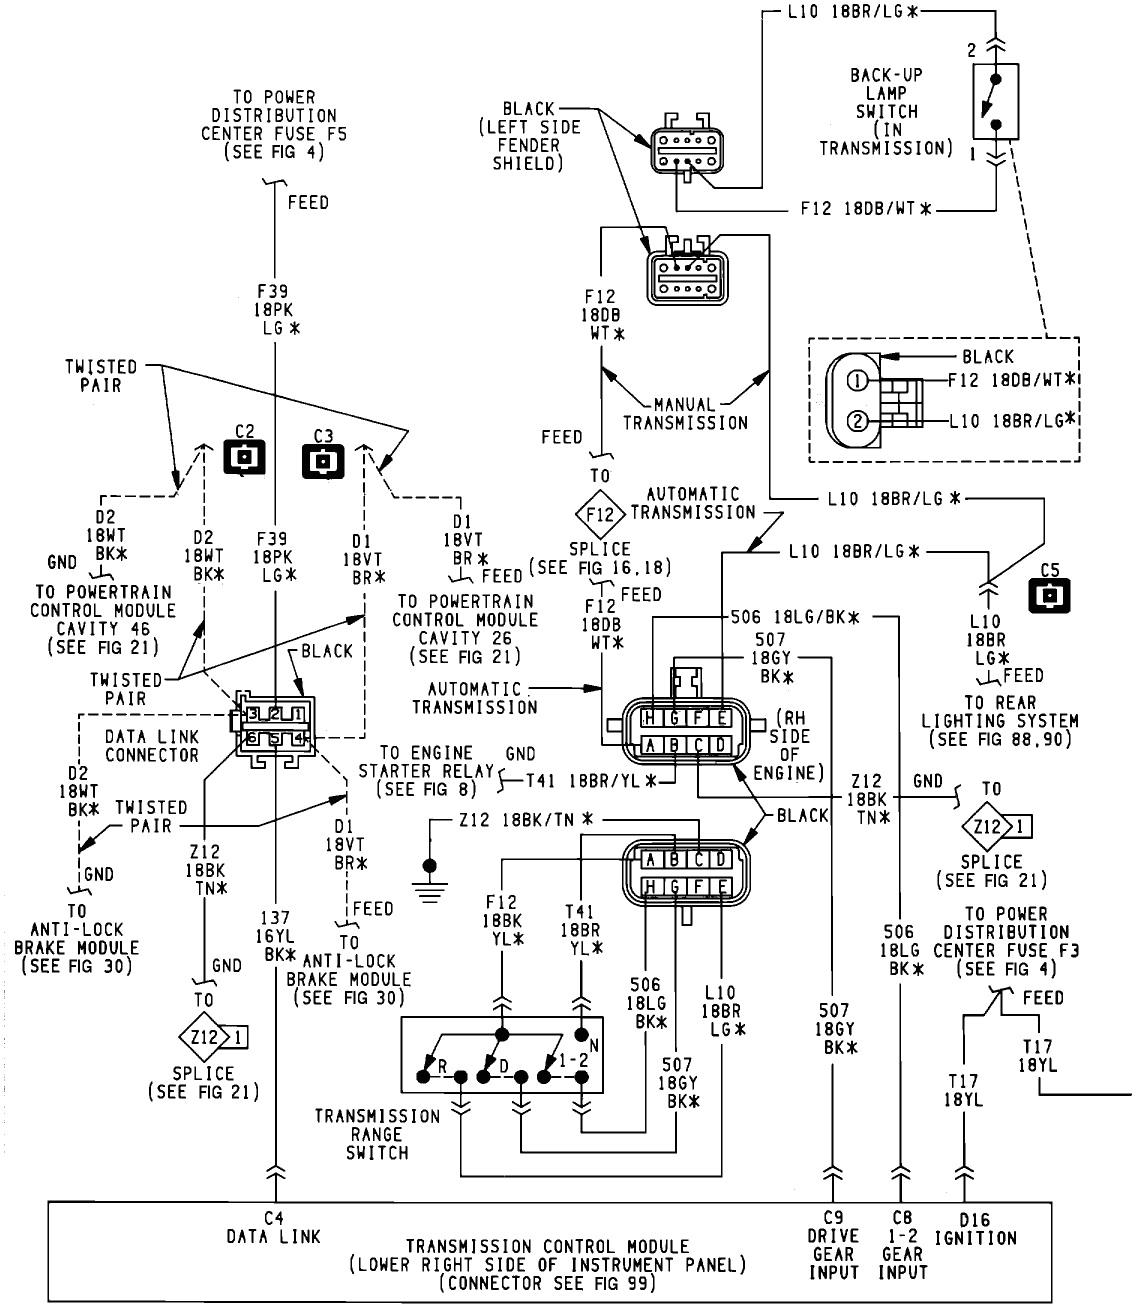 1994 jeep cherokee starter wiring wiring diagram used 1994 jeep cherokee country fuse diagram 1994 jeep cherokee fuse diagram